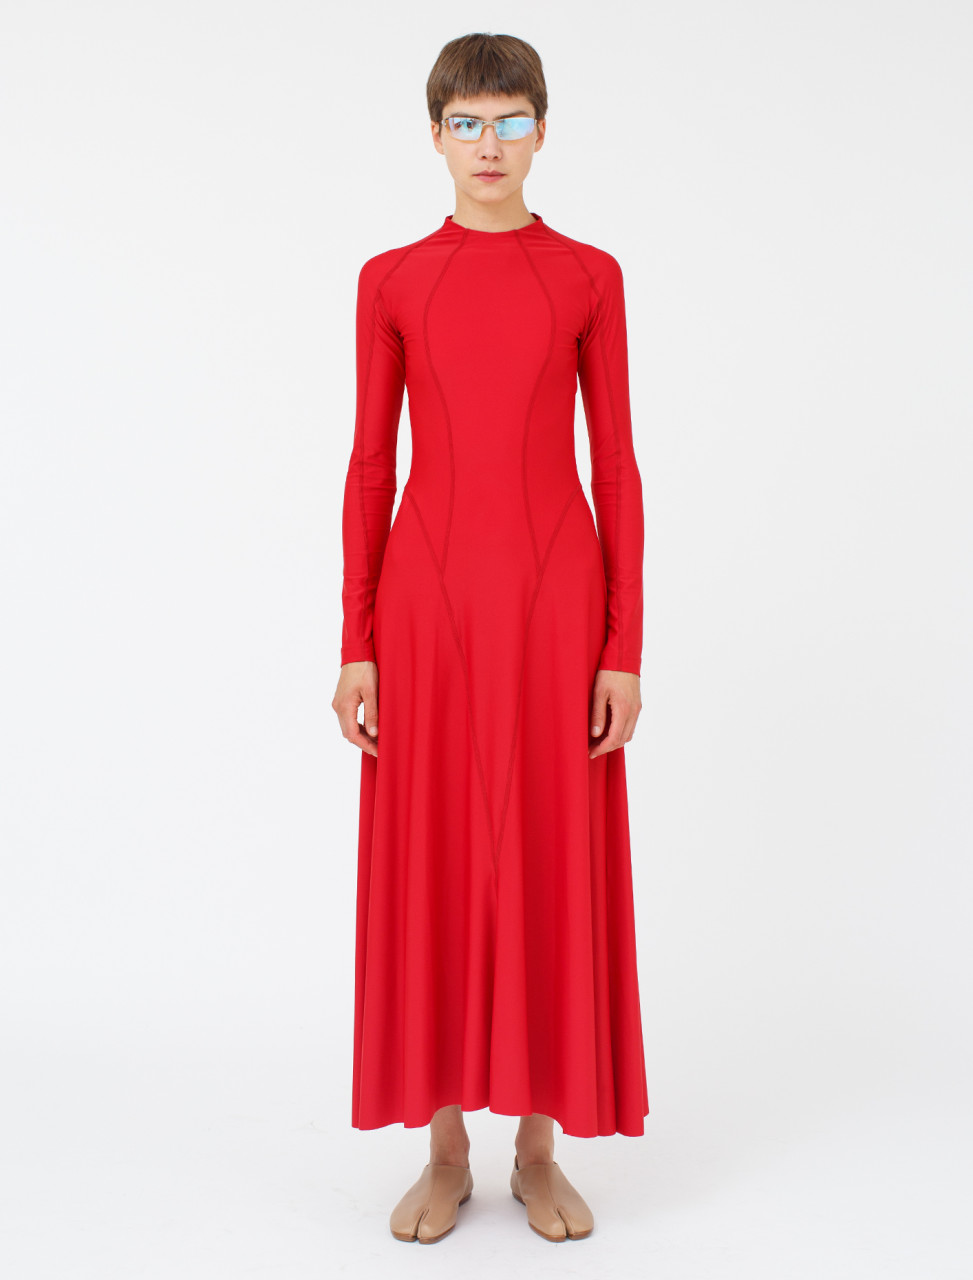 Elif Dress